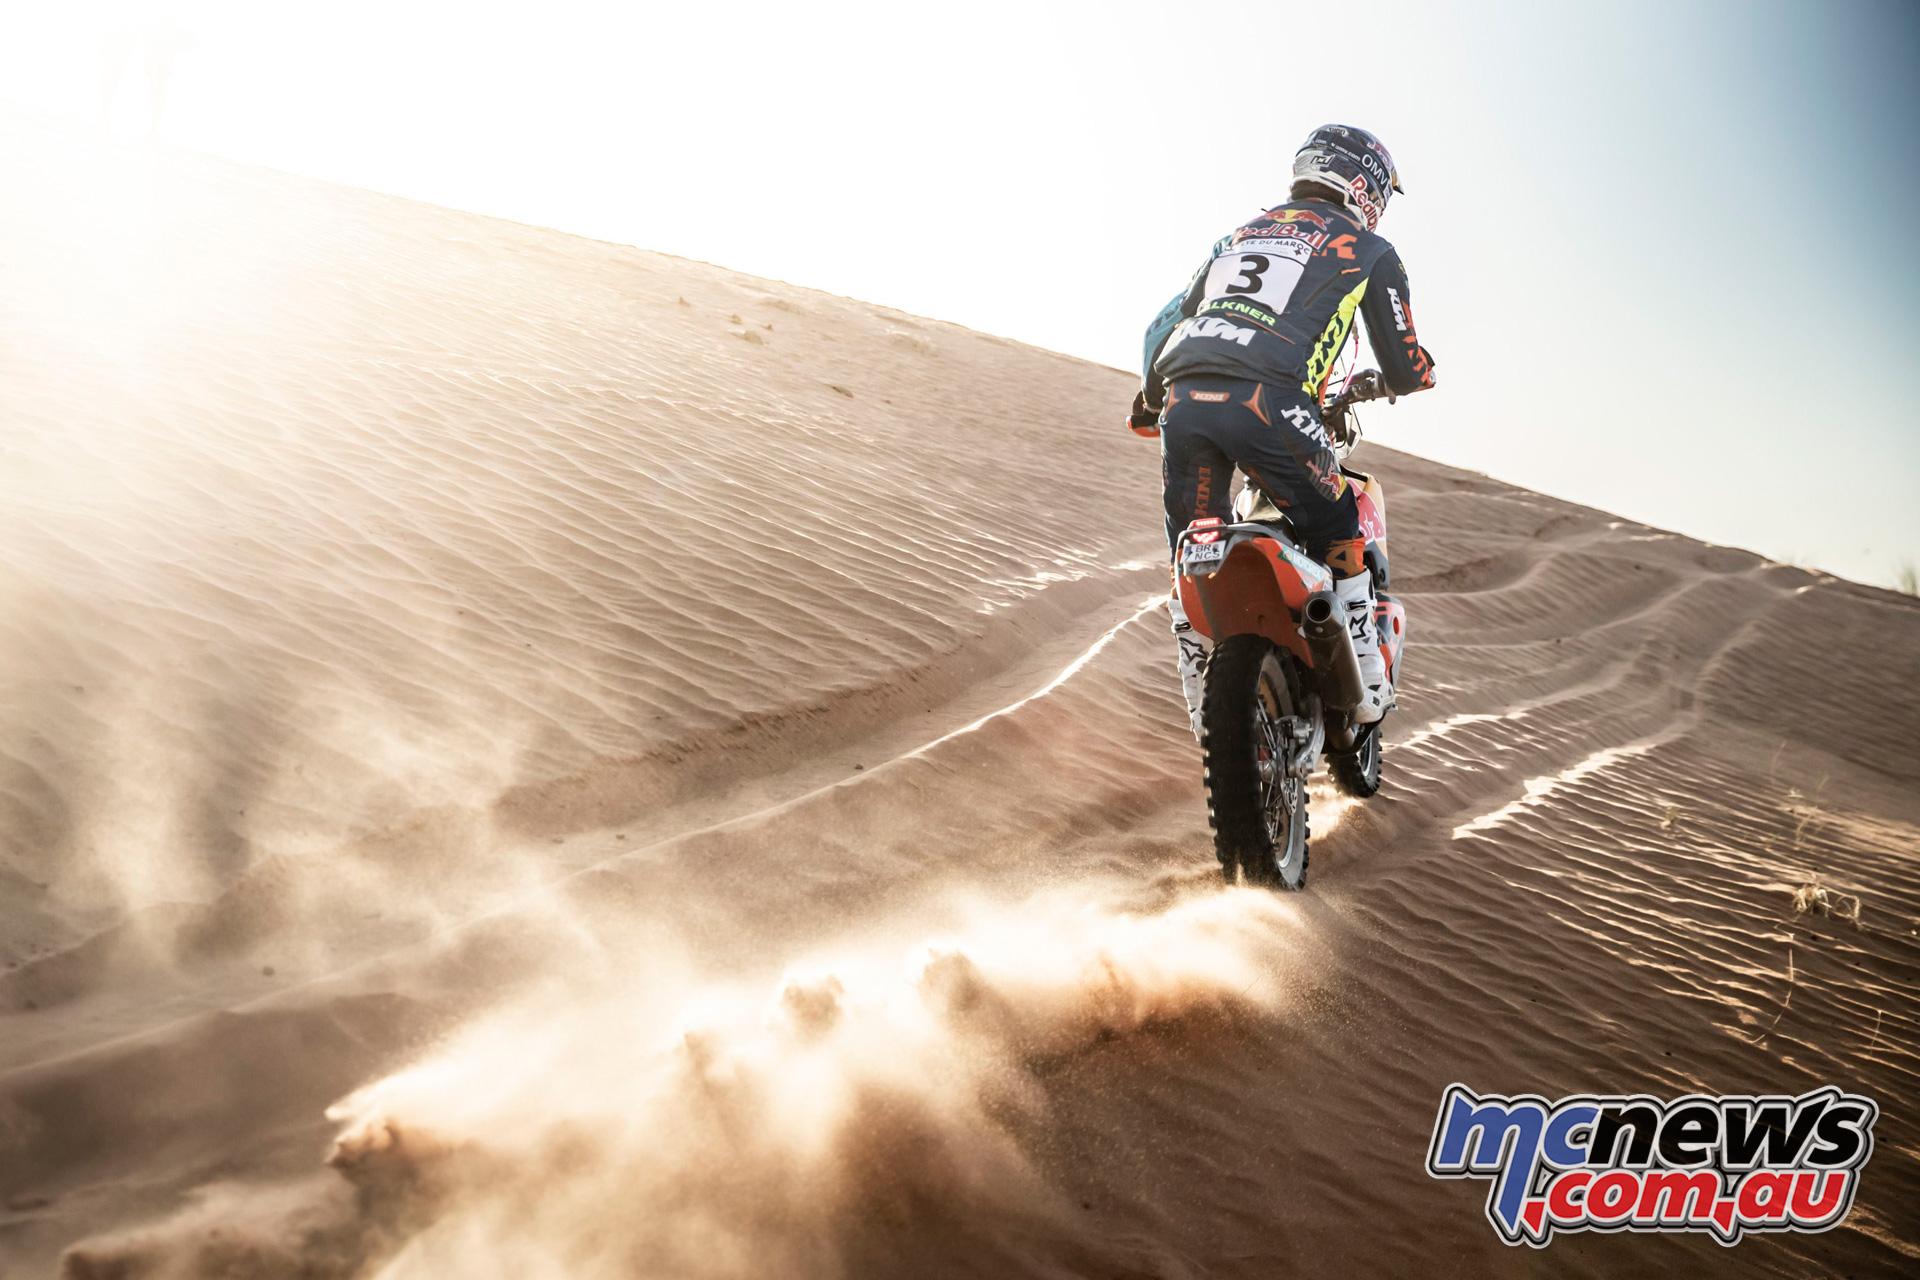 Matthias Walkner KTM RALLY Rally du Maroc